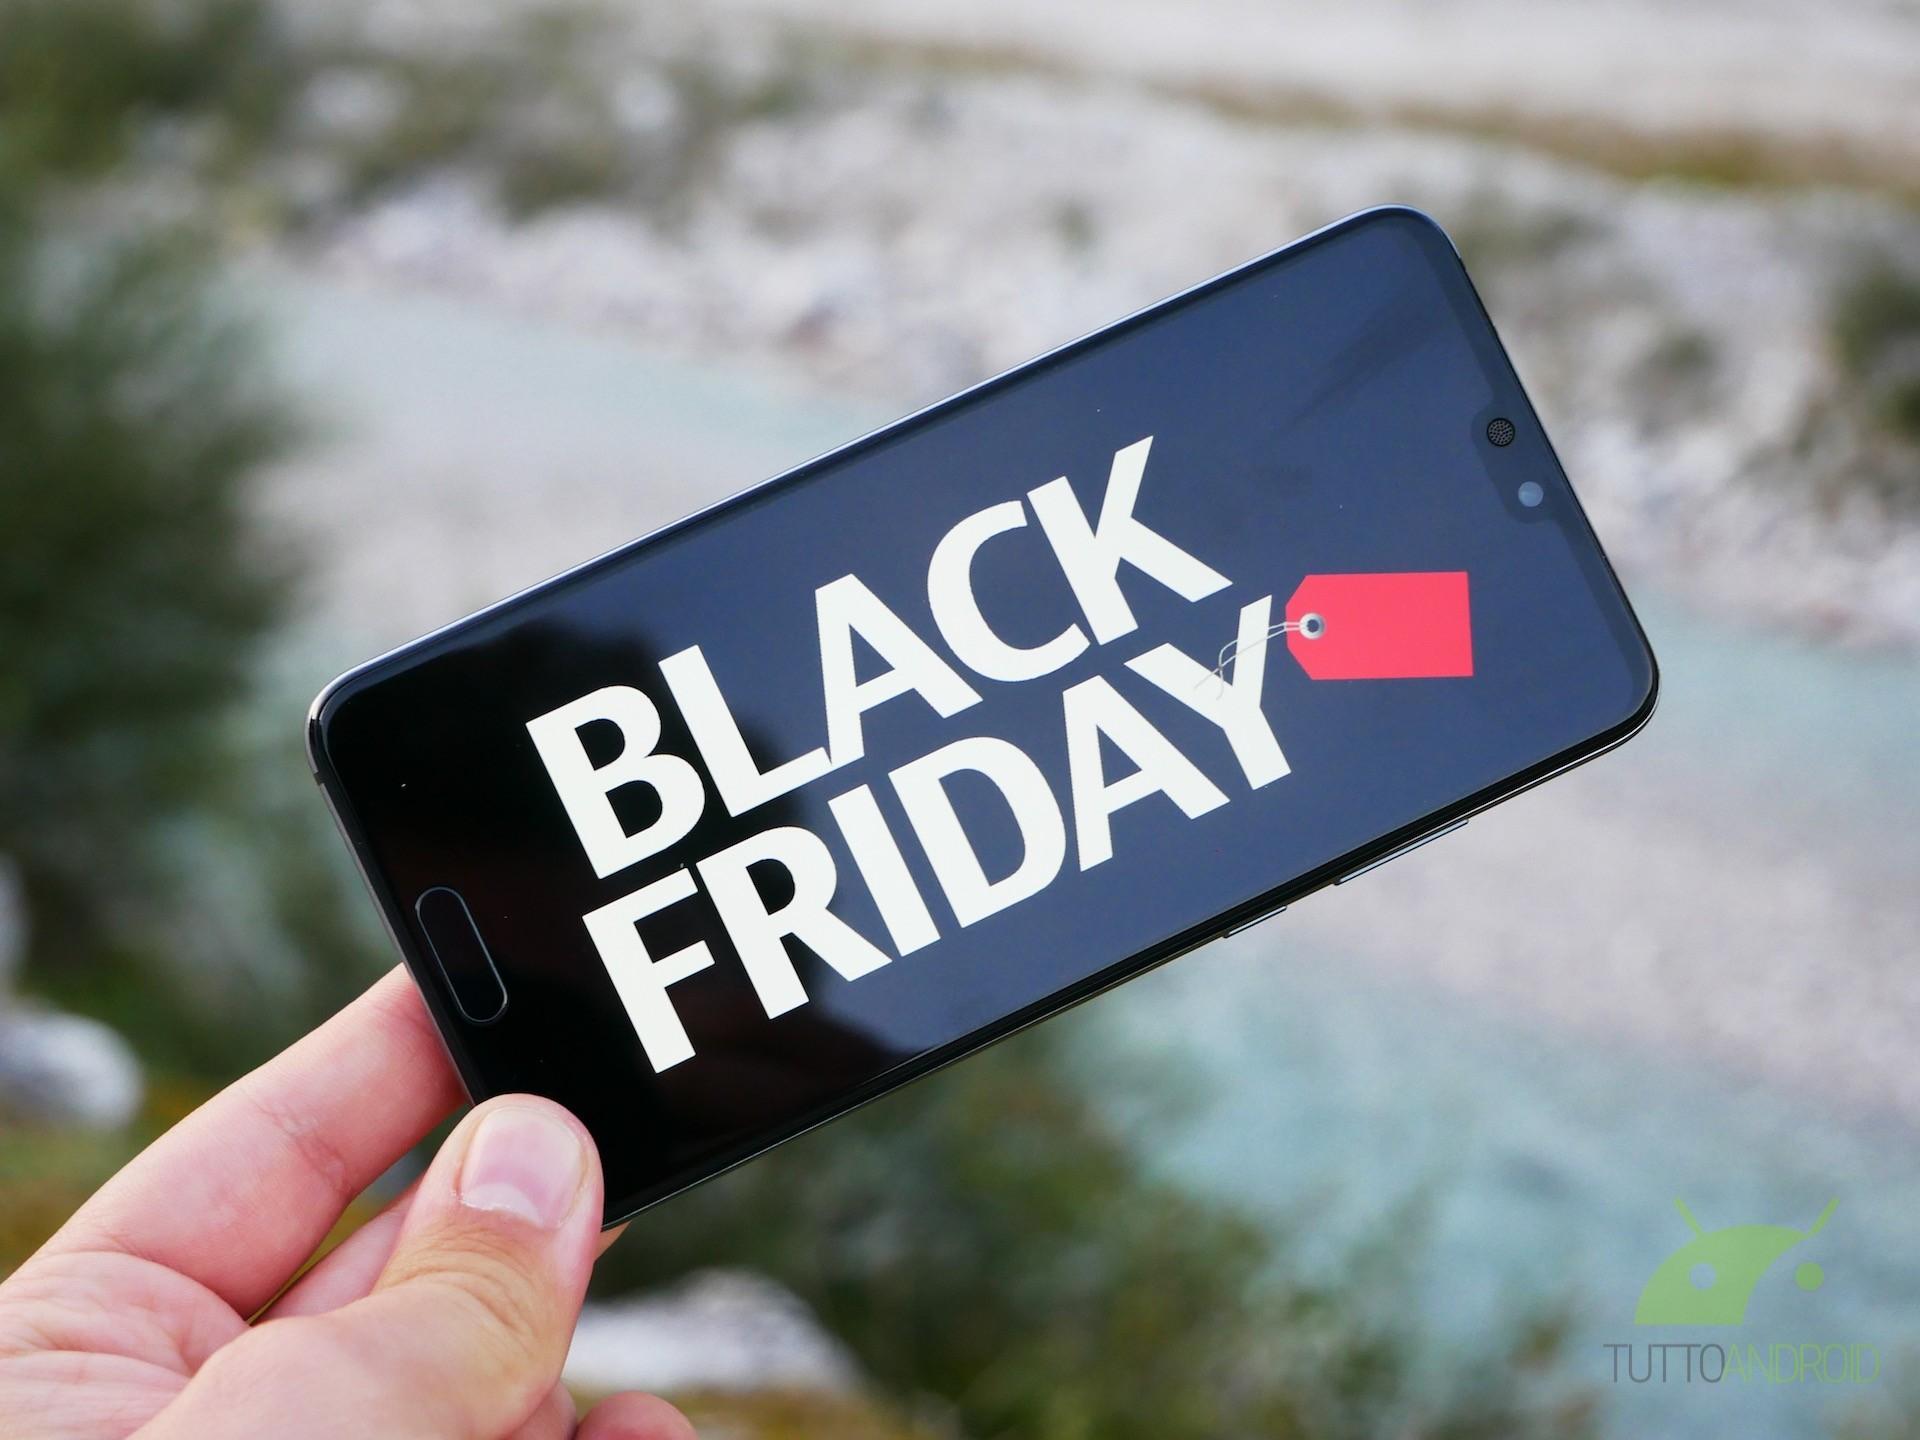 Offerte Live Black Friday 2020: 1 nuova offerta ogni minuto